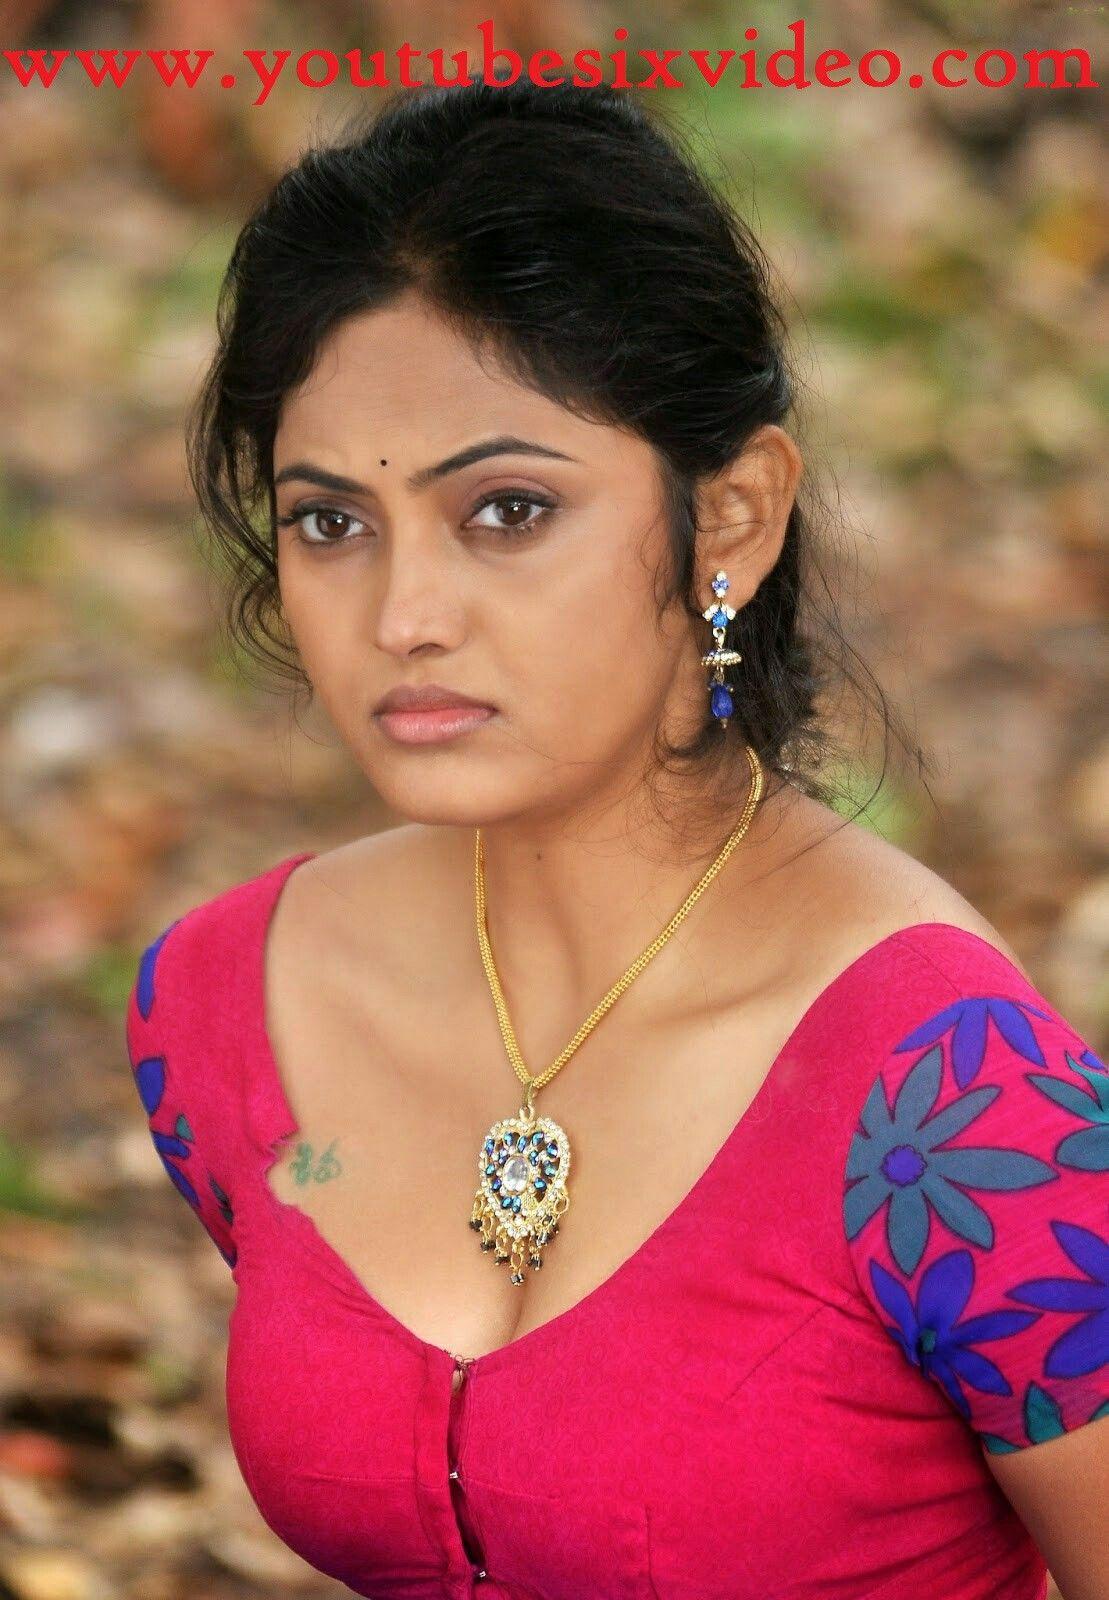 Indian Girls Anus Top pinsyed. hai on hot girls | pinterest | girls